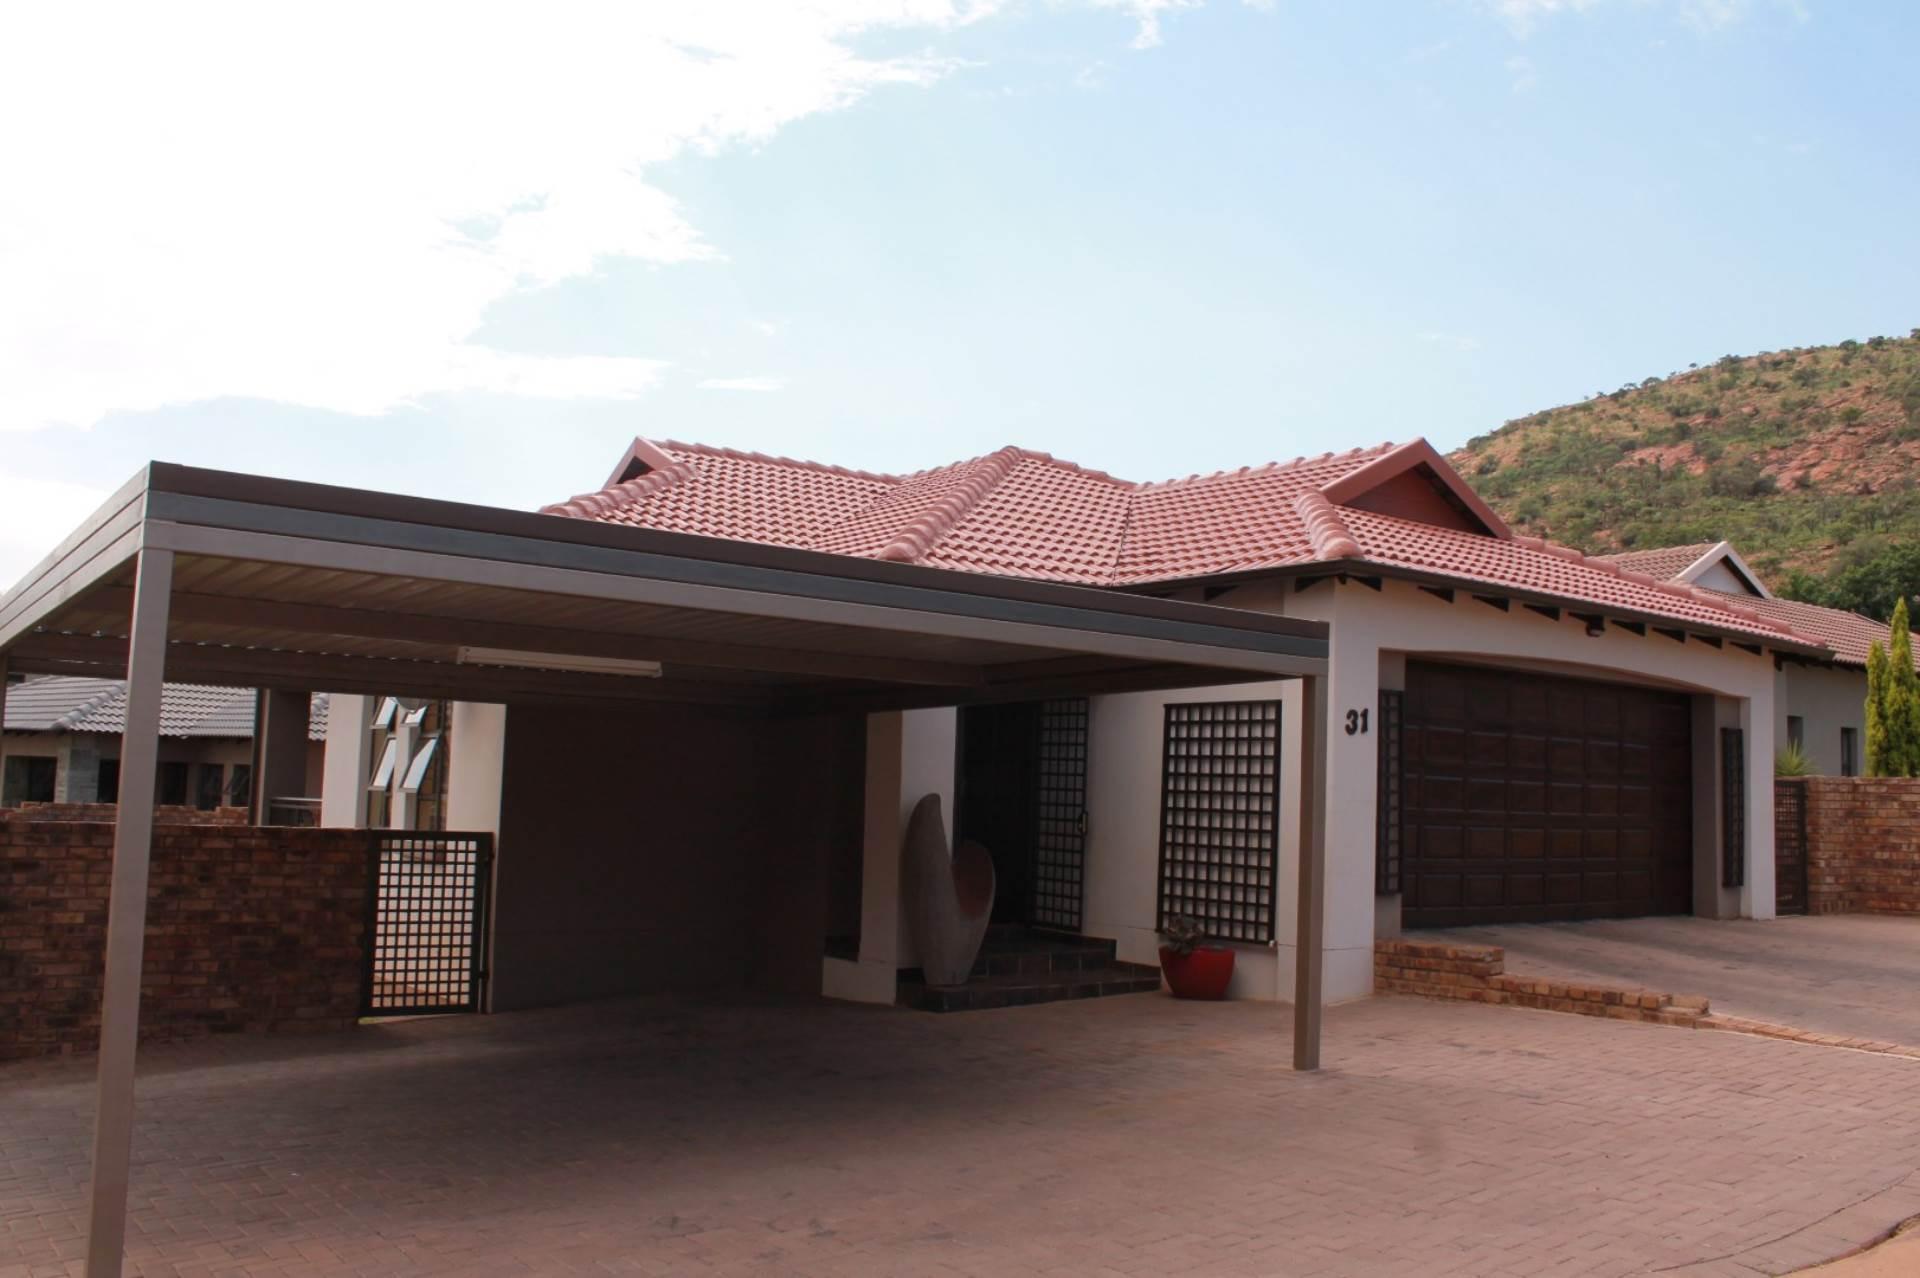 Akasia, Ninapark Property  | Houses For Sale Ninapark, NINAPARK, House 3 bedrooms property for sale Price:1,550,000